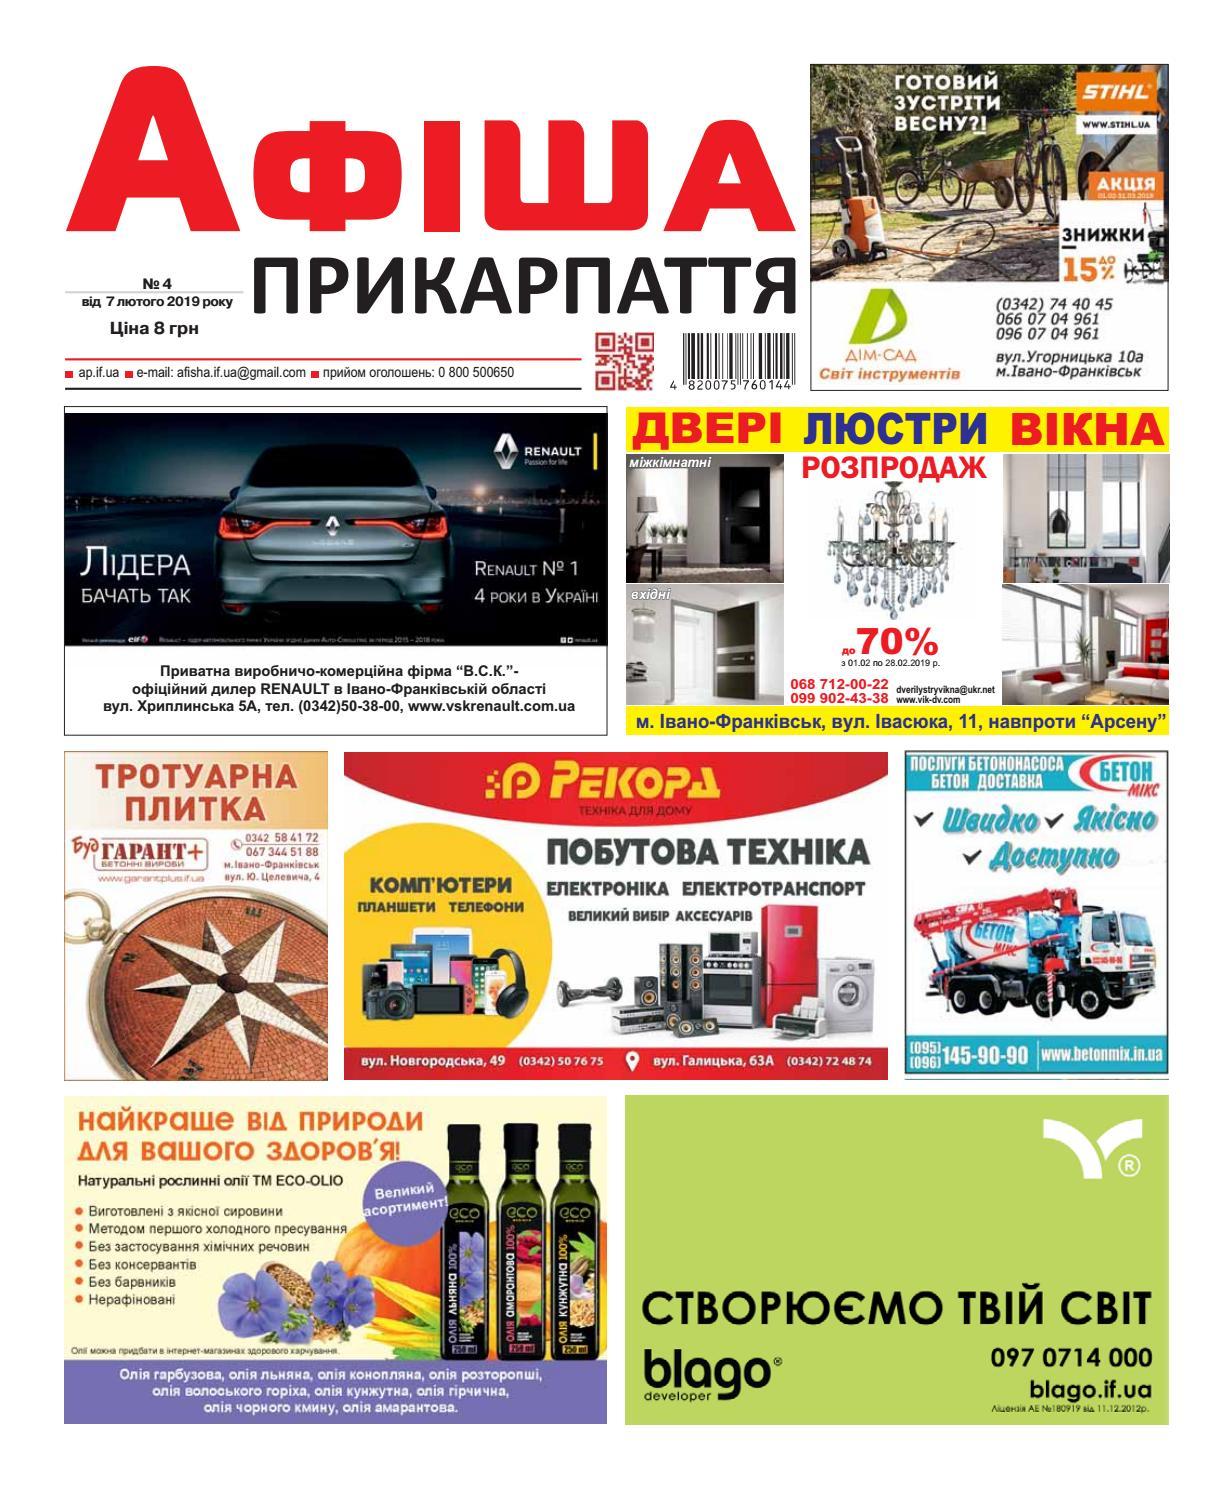 Афіша Прикарпаття №4 by Olya Olya - issuu d91a8b9bce028